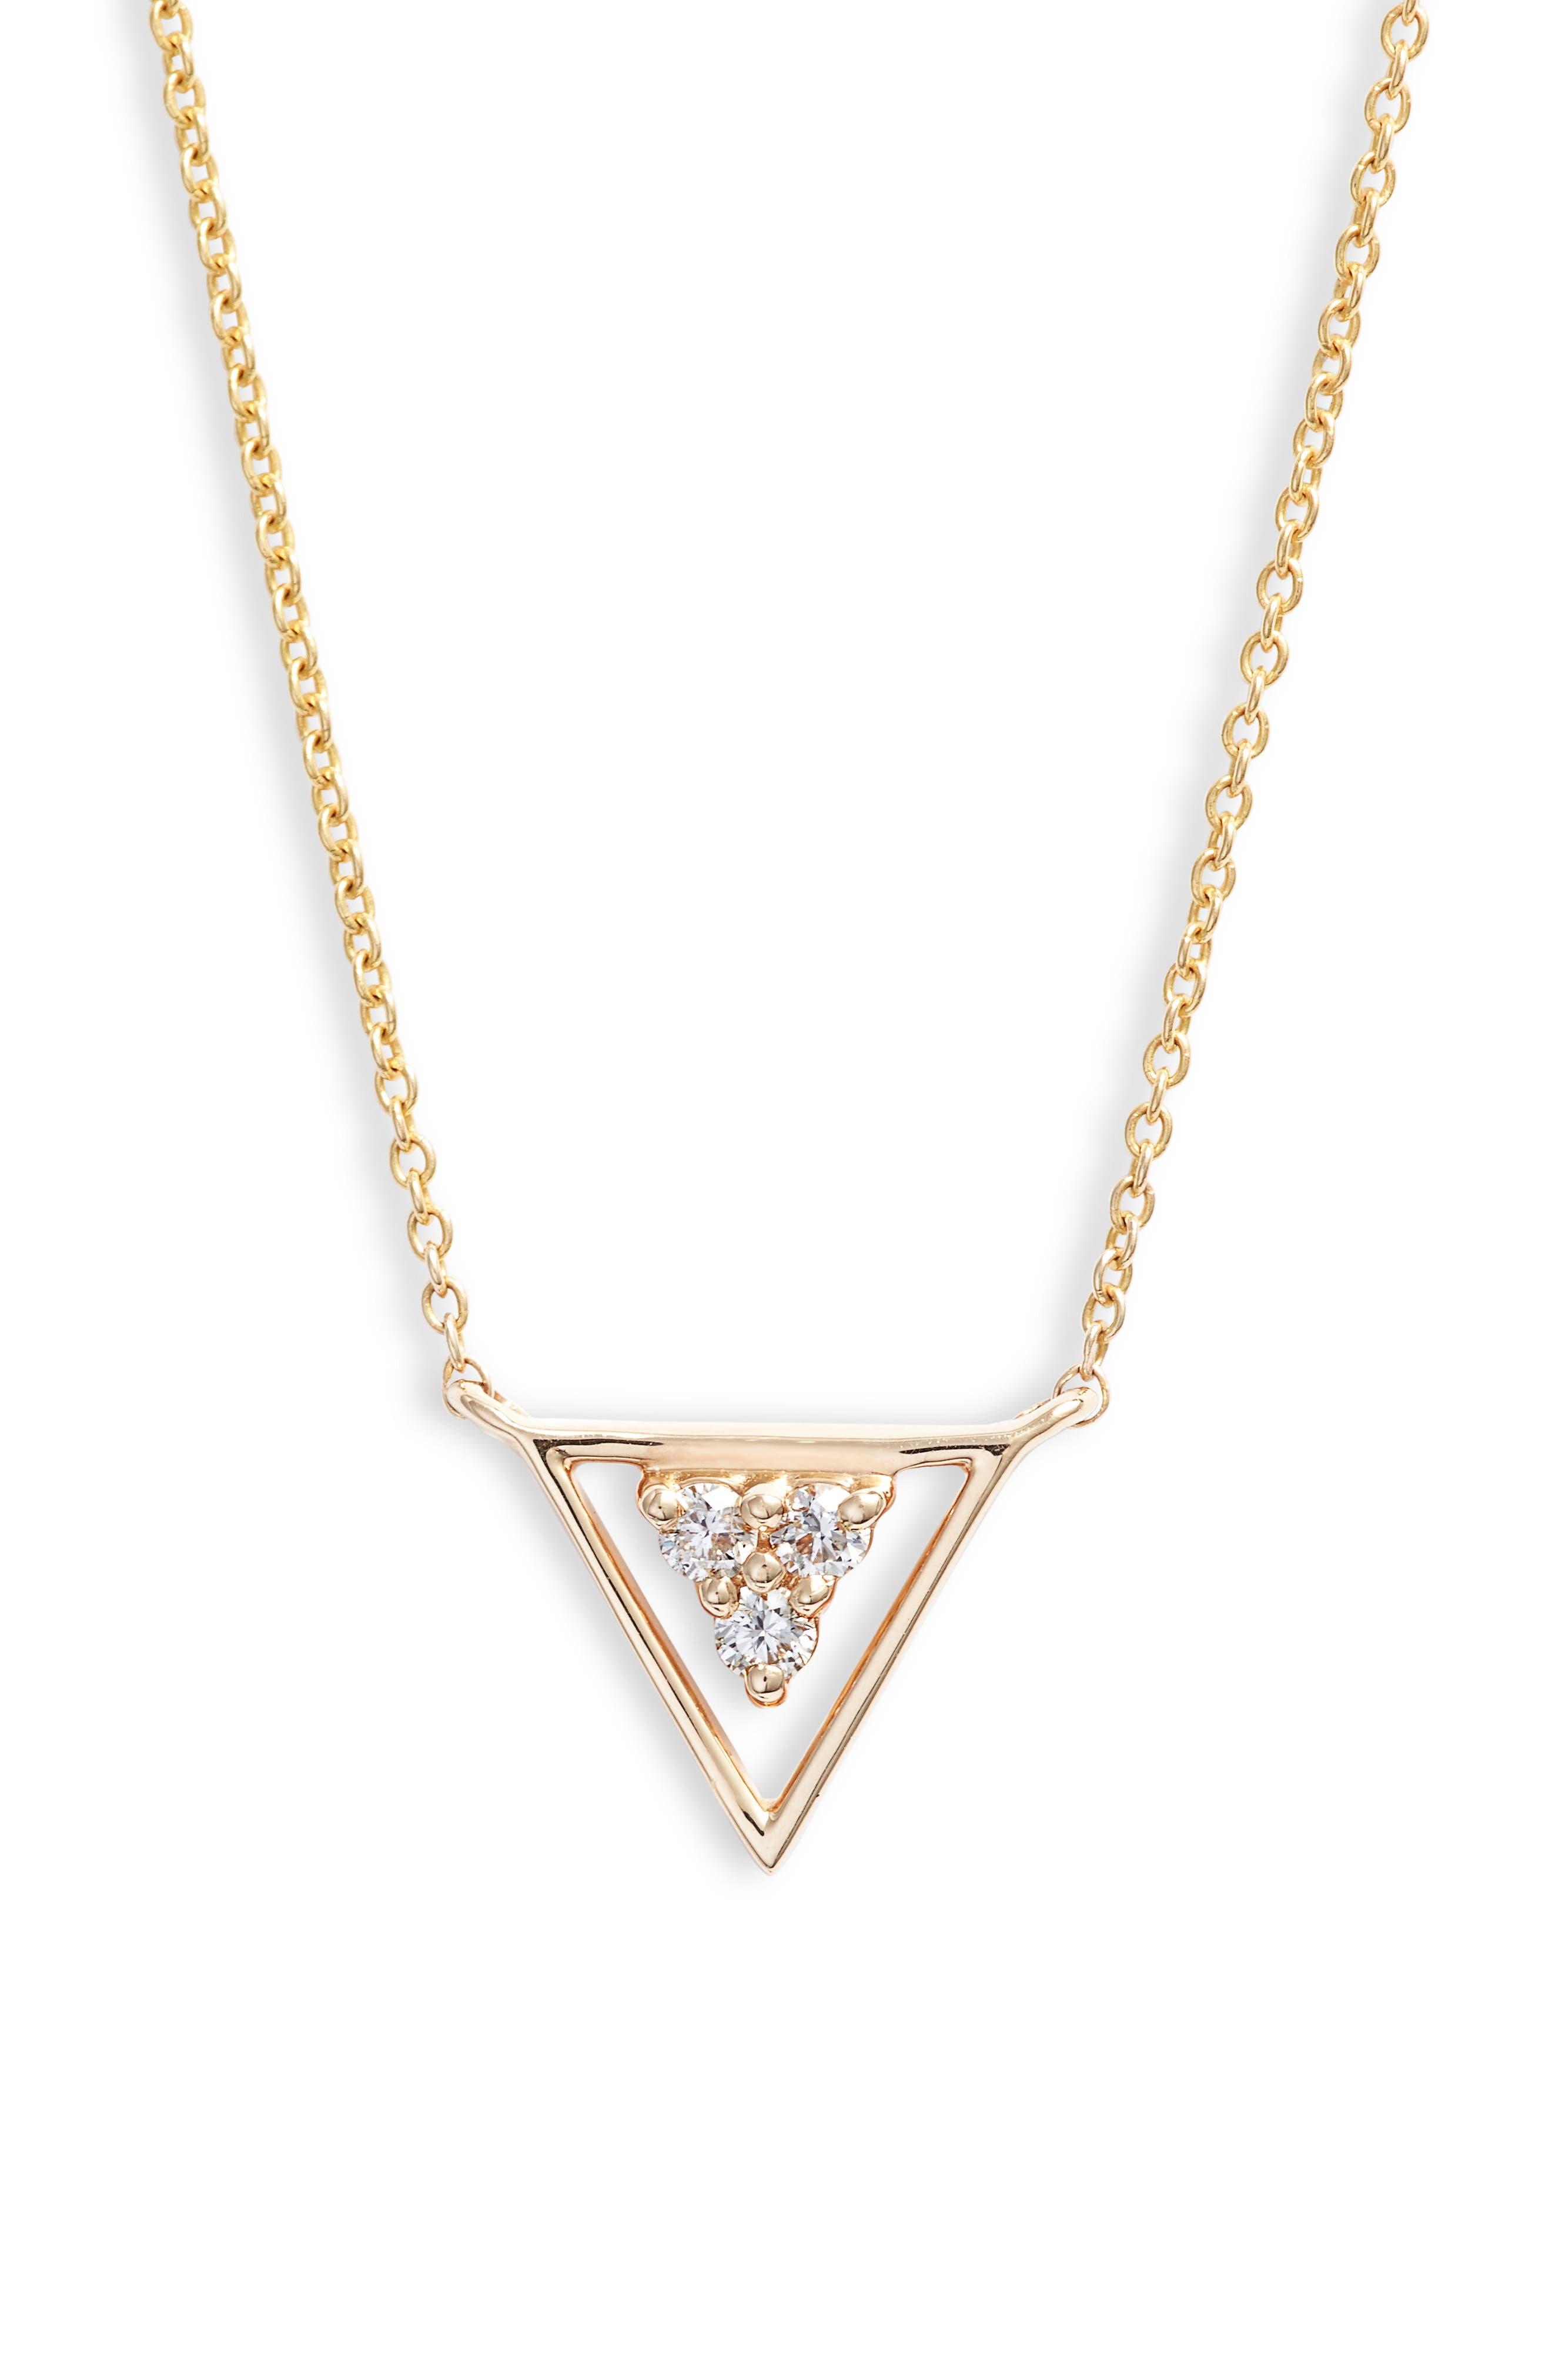 DANA REBECCA DESIGNS,                             Ivy Diamond Triangle Pendant Necklace,                             Main thumbnail 1, color,                             YELLOW GOLD/ PEARL